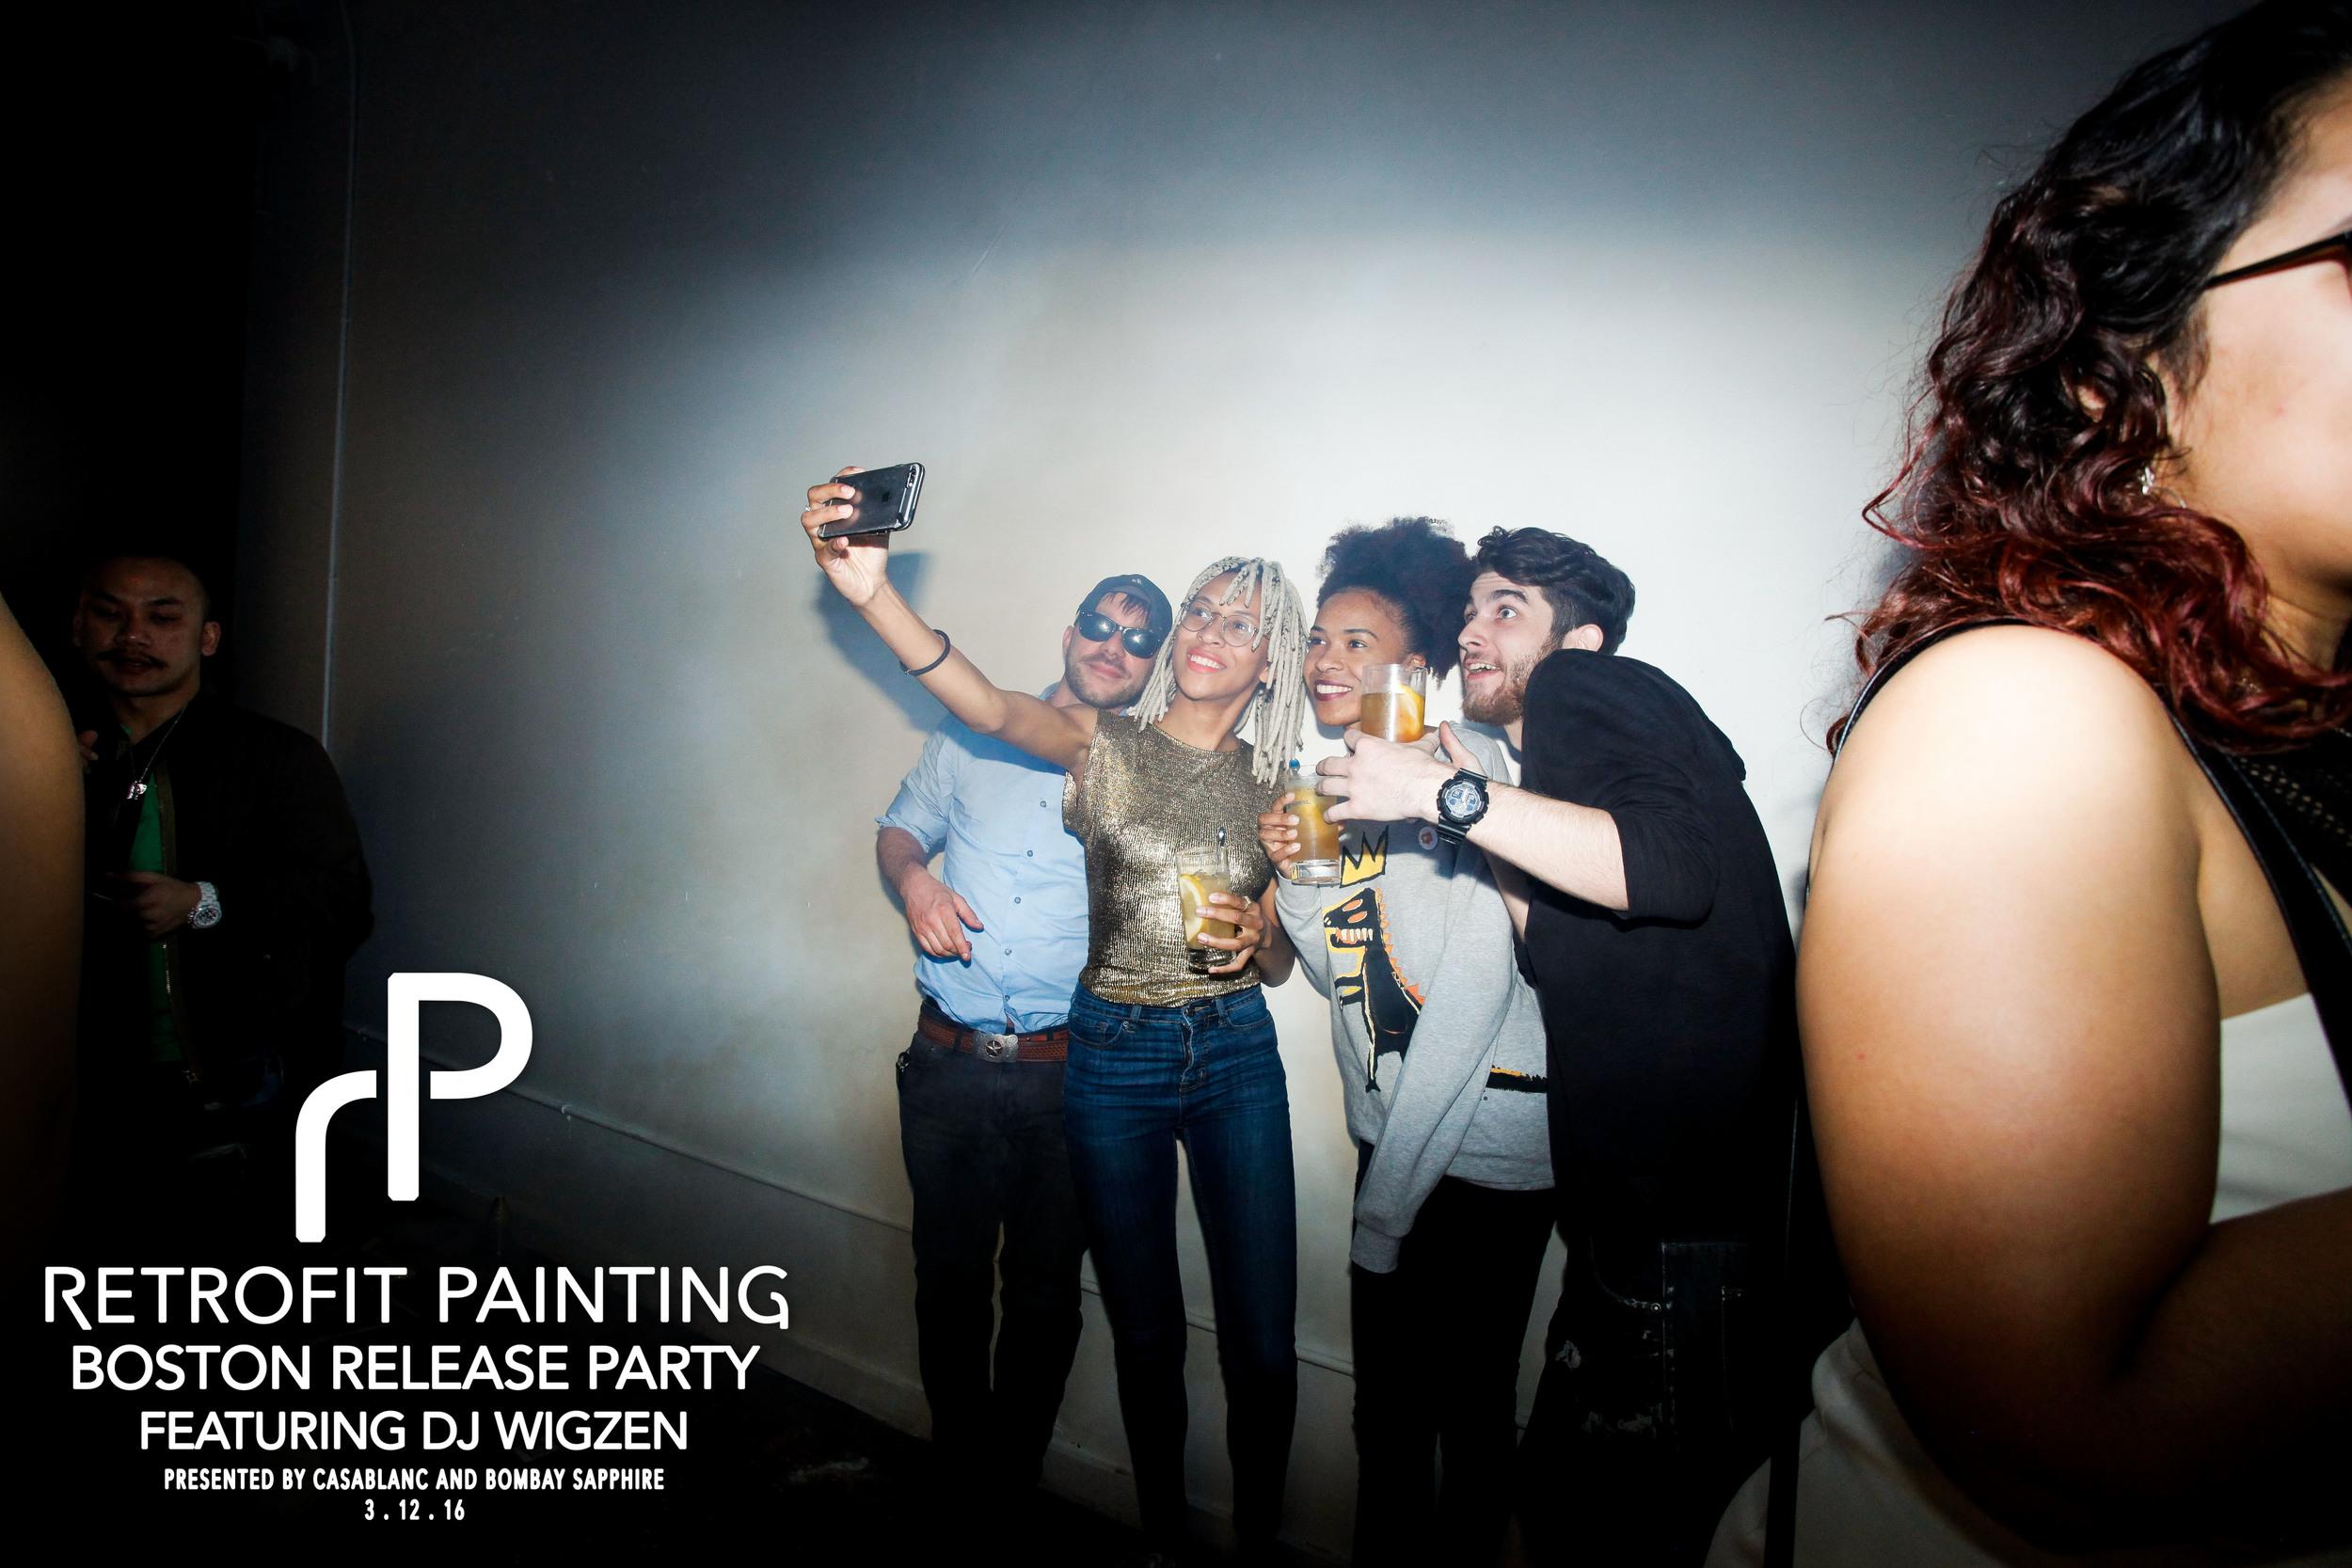 Retrofit Painting Boston Release Party 0029.jpg